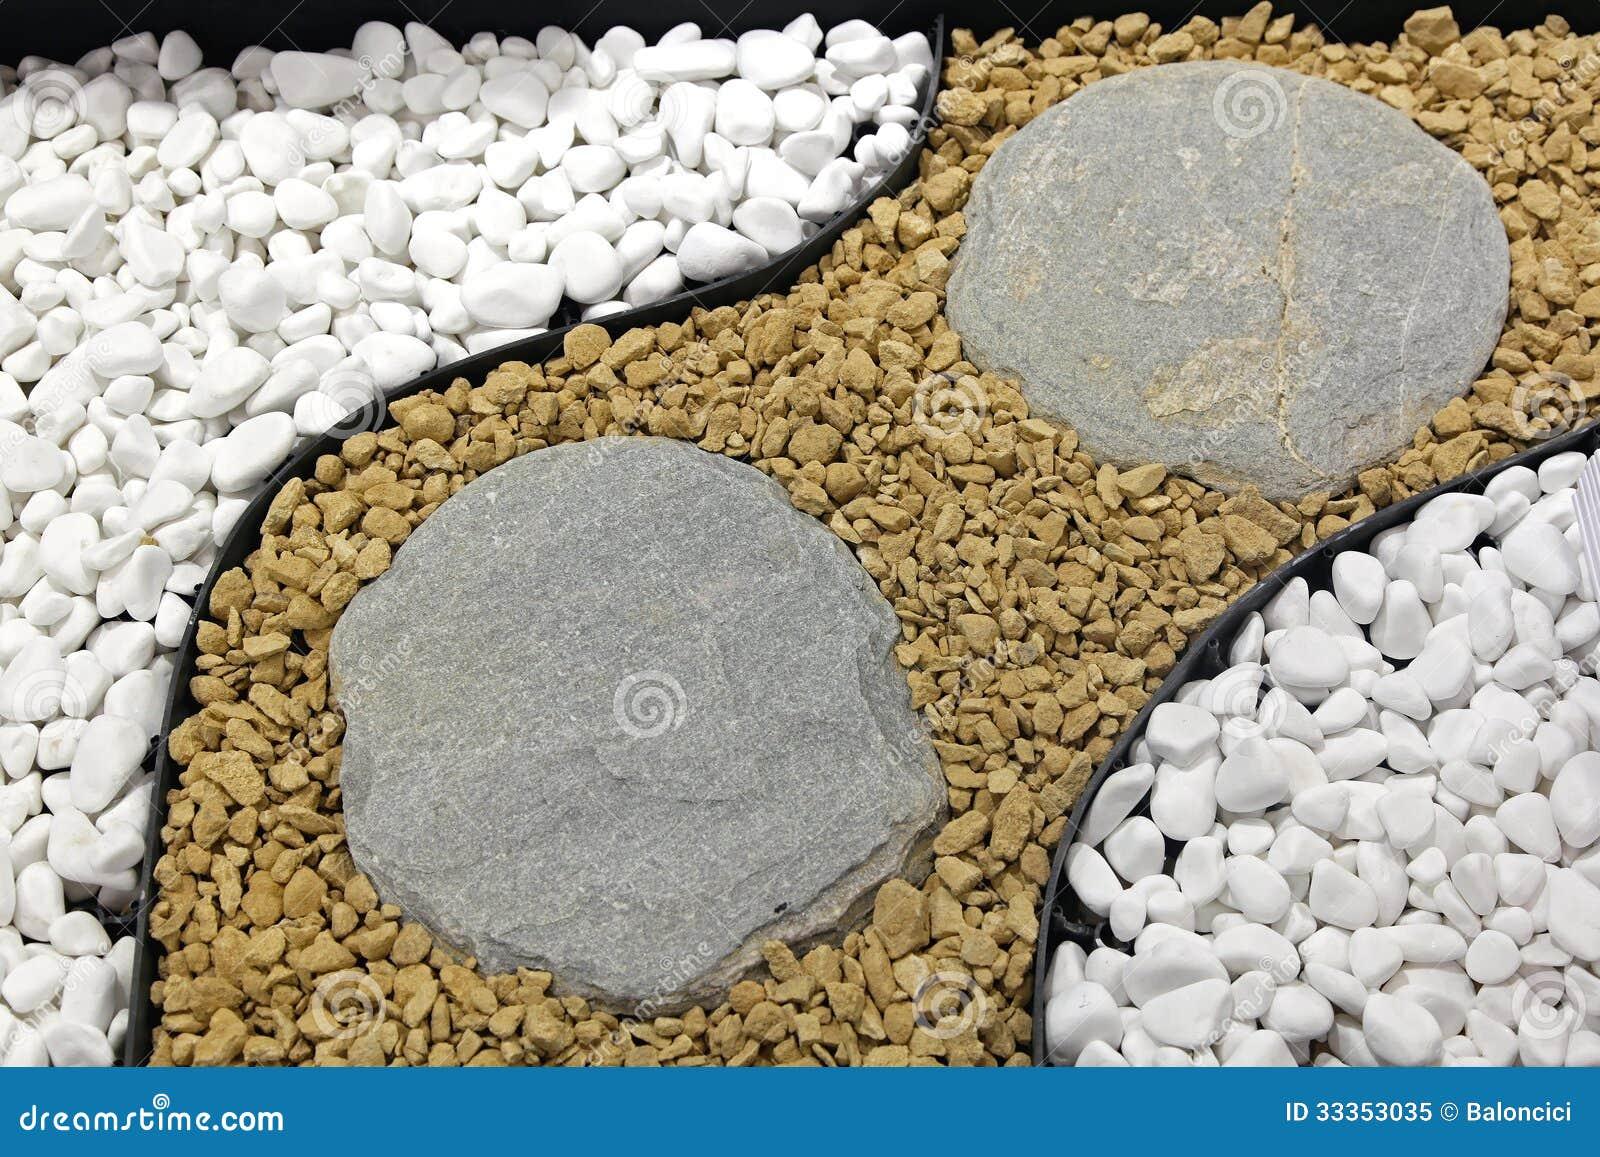 Decorative Pebbles For Landscaping : Decorative stones stock image of pebbles decor